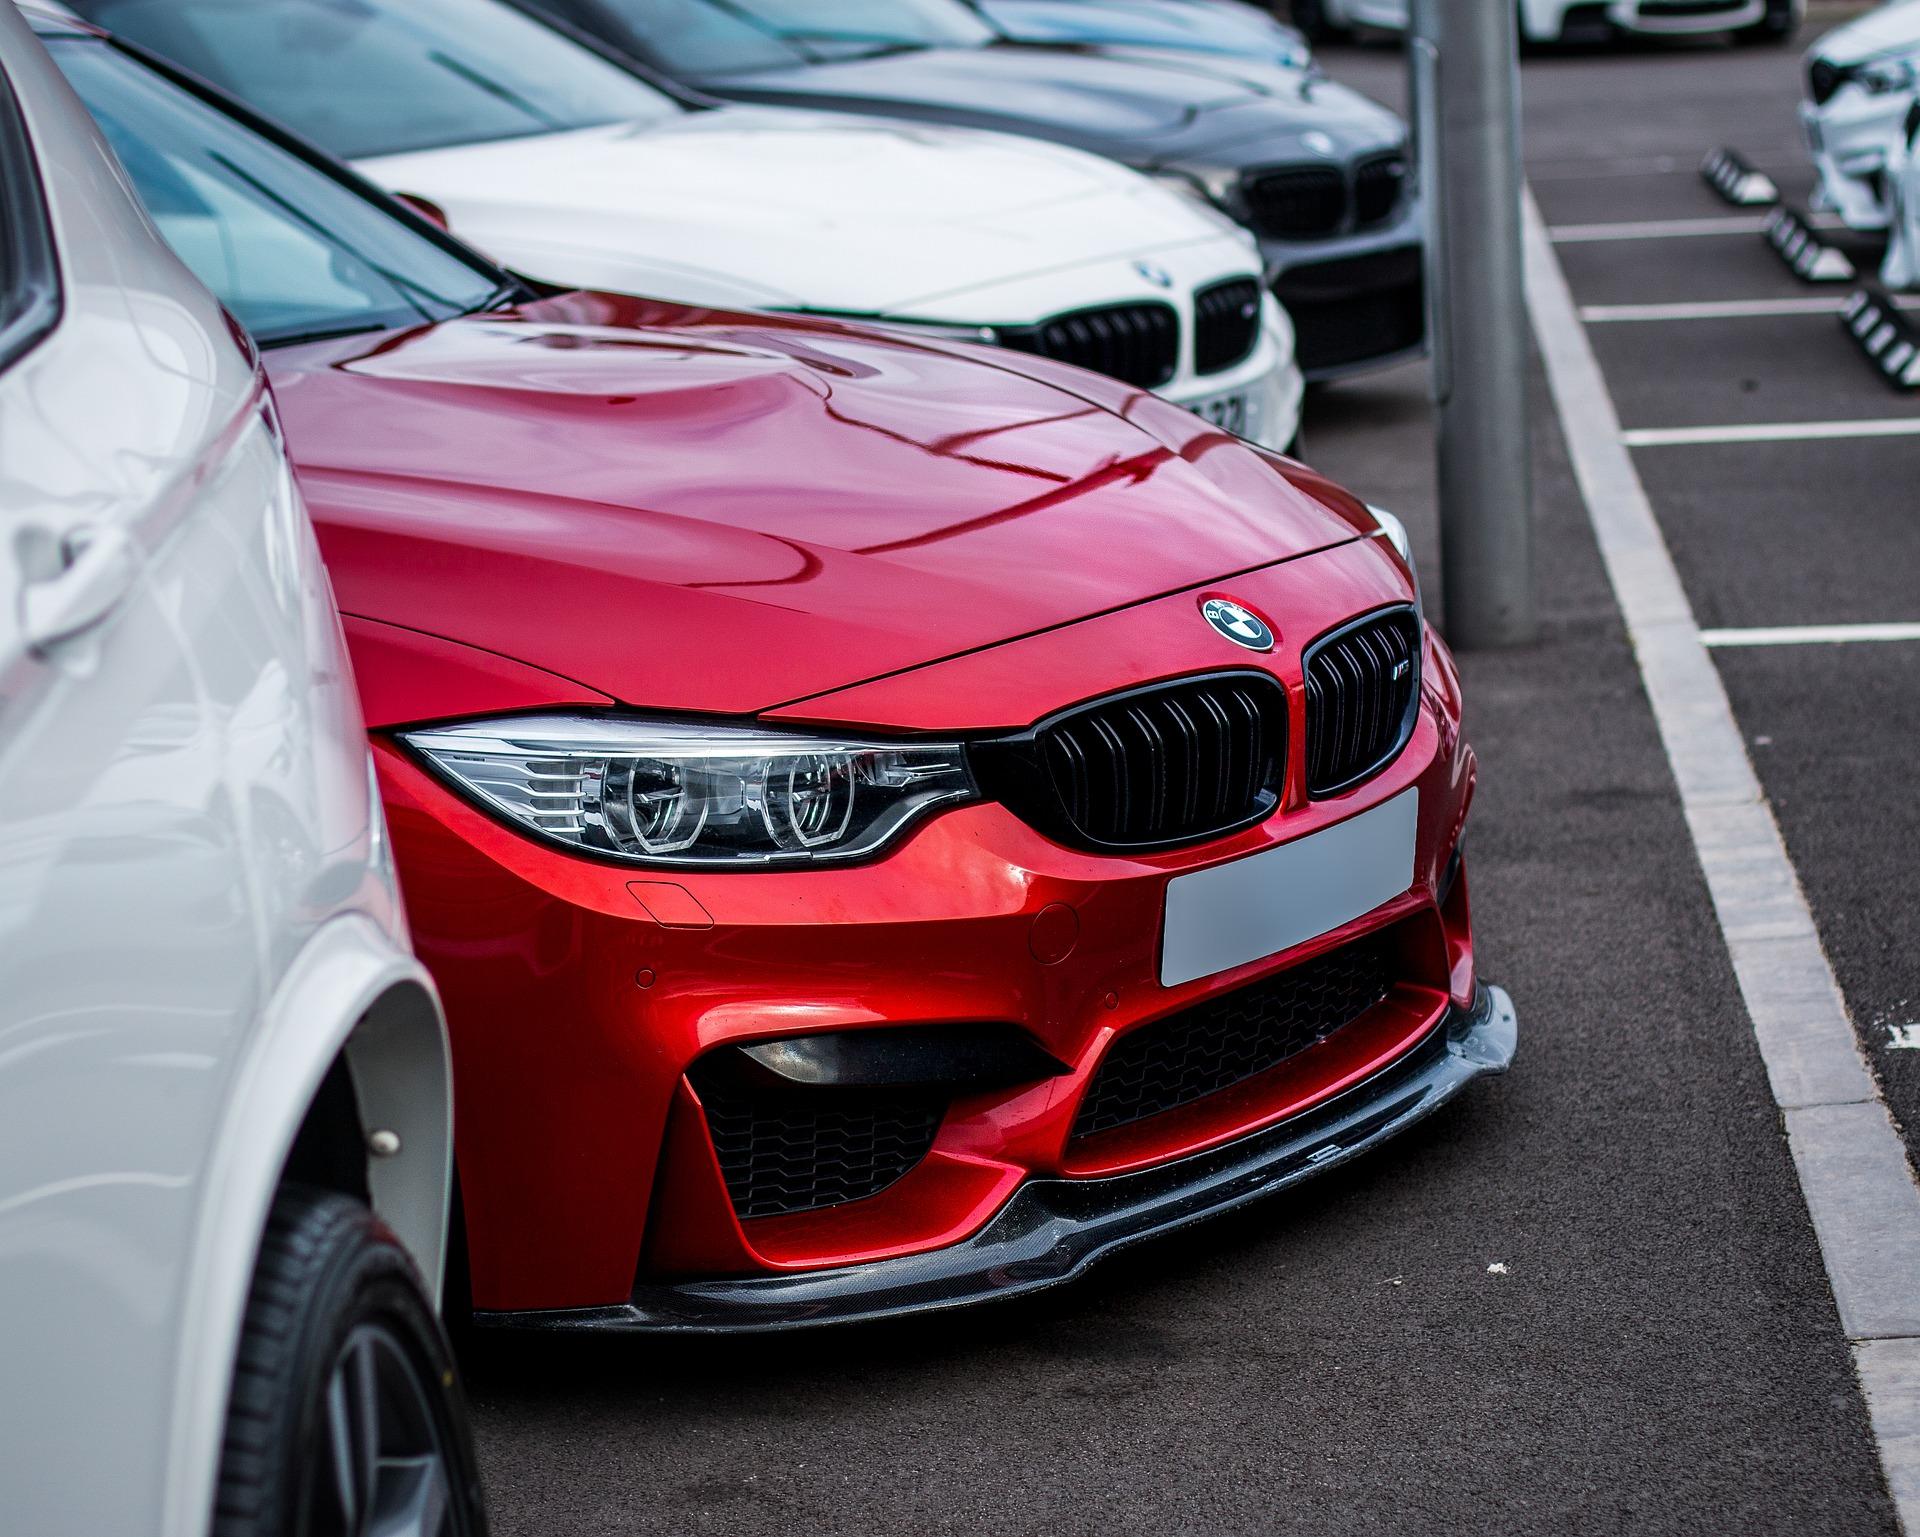 BMW Abgasskandal